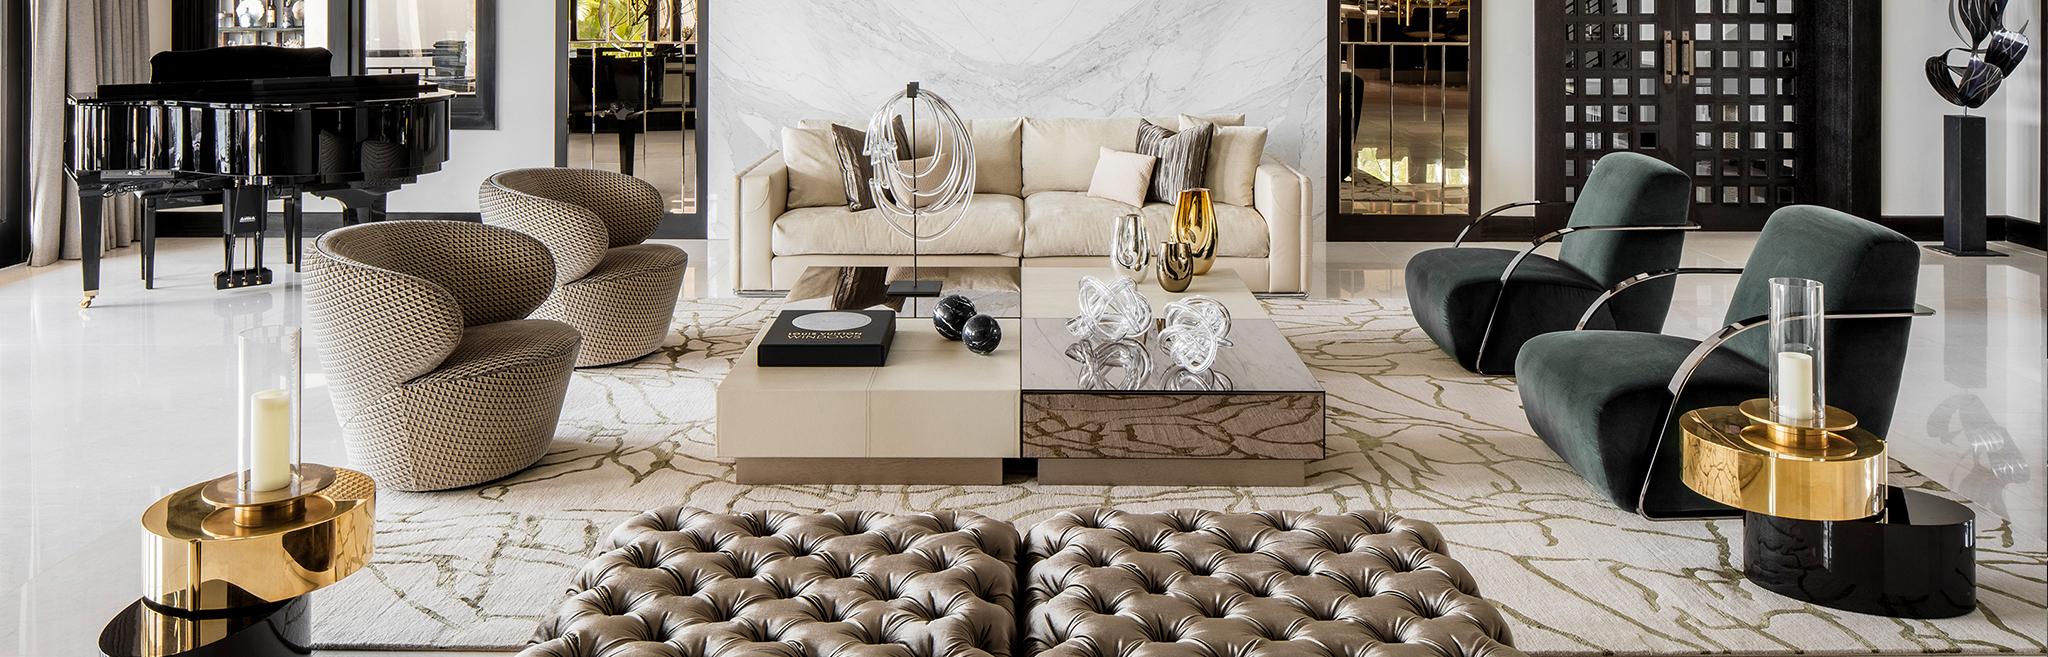 Buyer Select Decorating Ideas | Lifestyle Blog